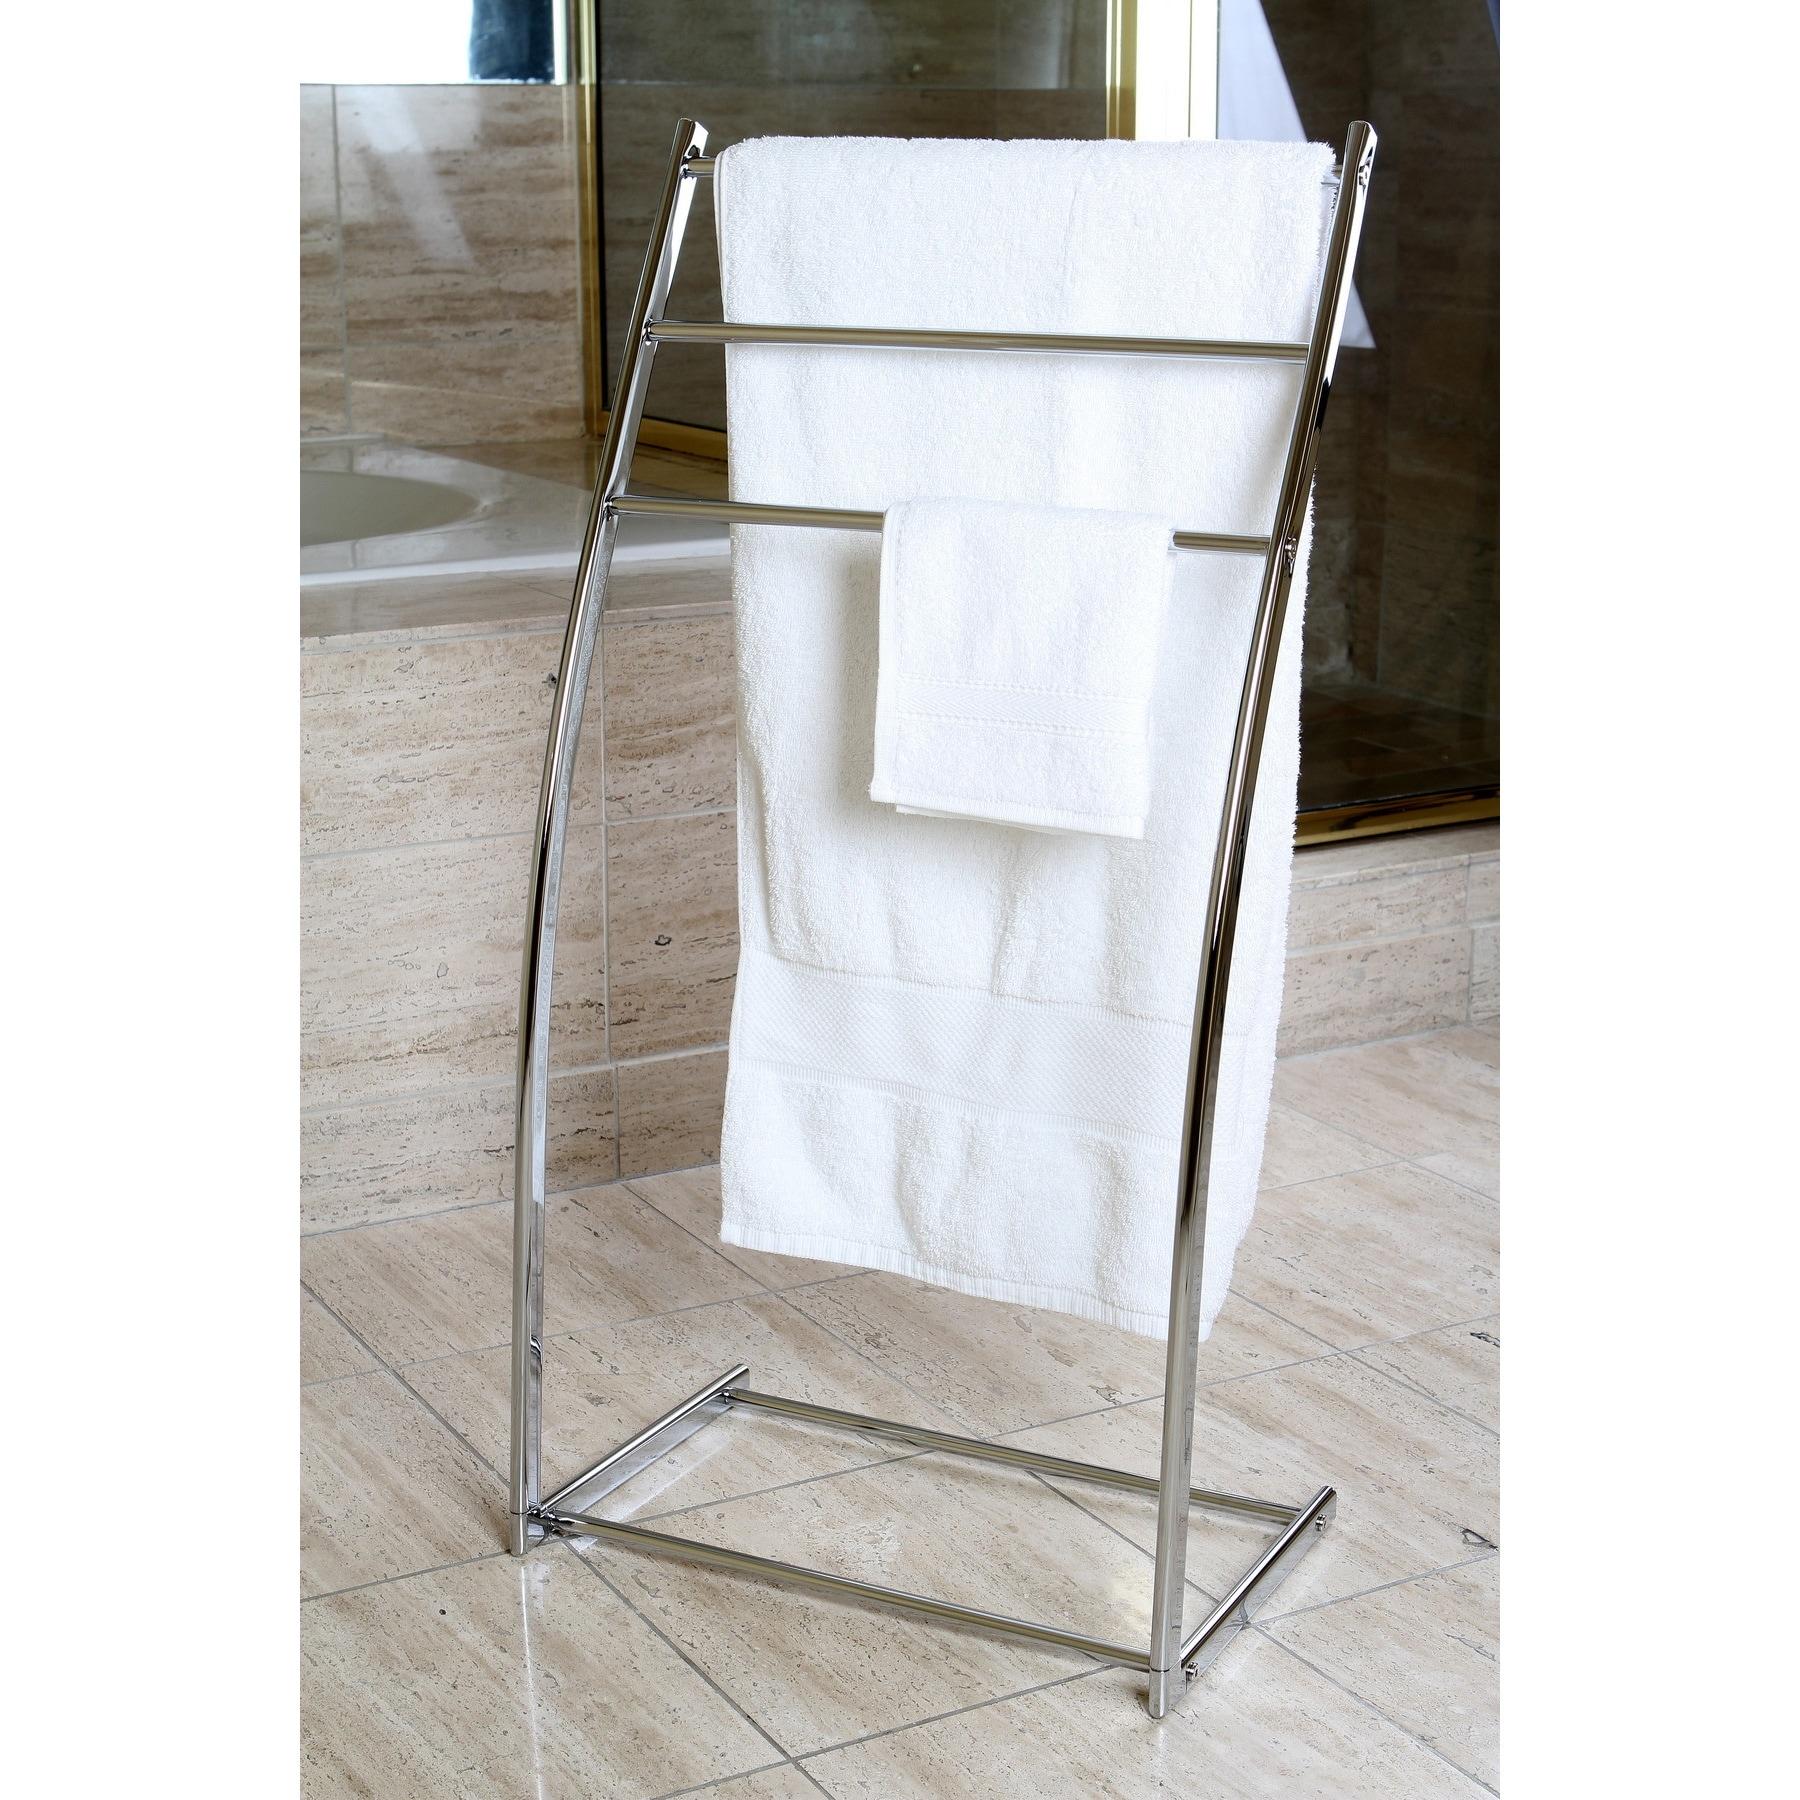 Kingston Brass Pedestal Chrome Iron Towel Rack (Chrome), ...